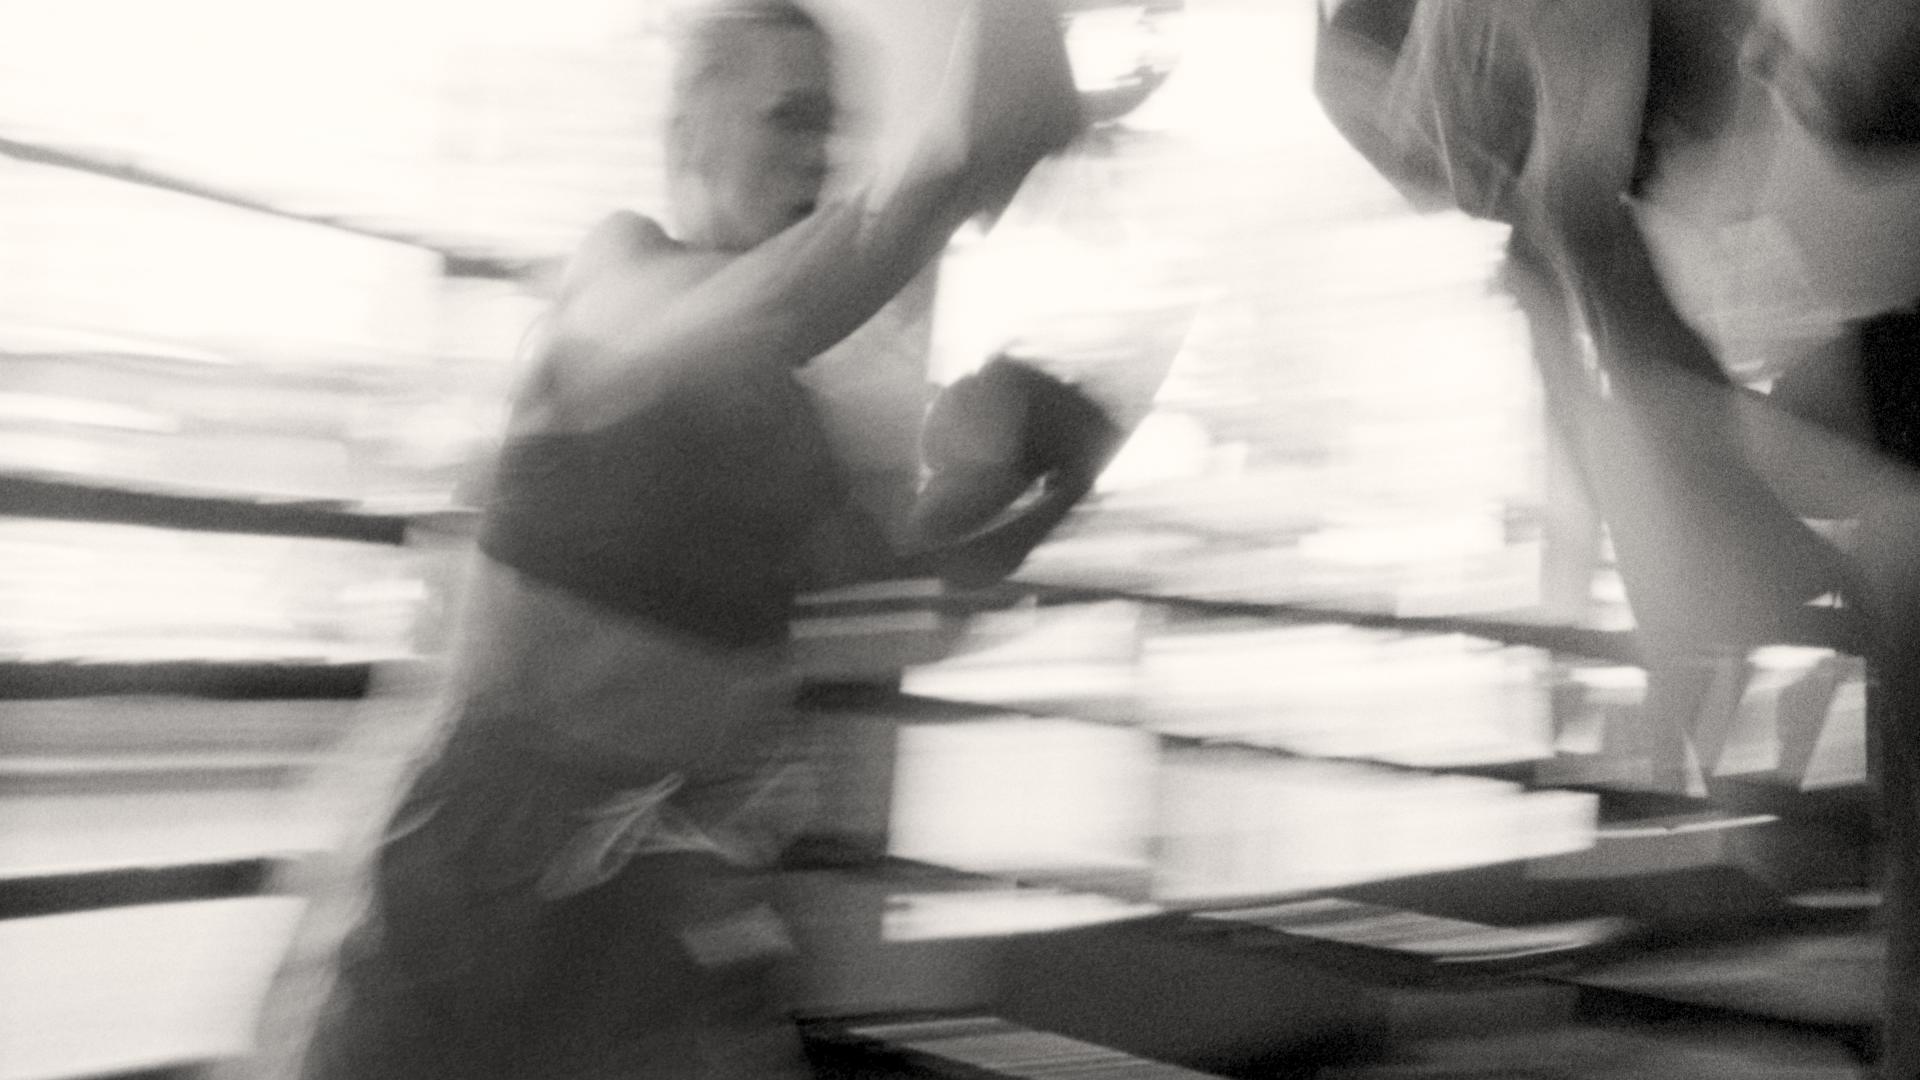 woman boxing blurry